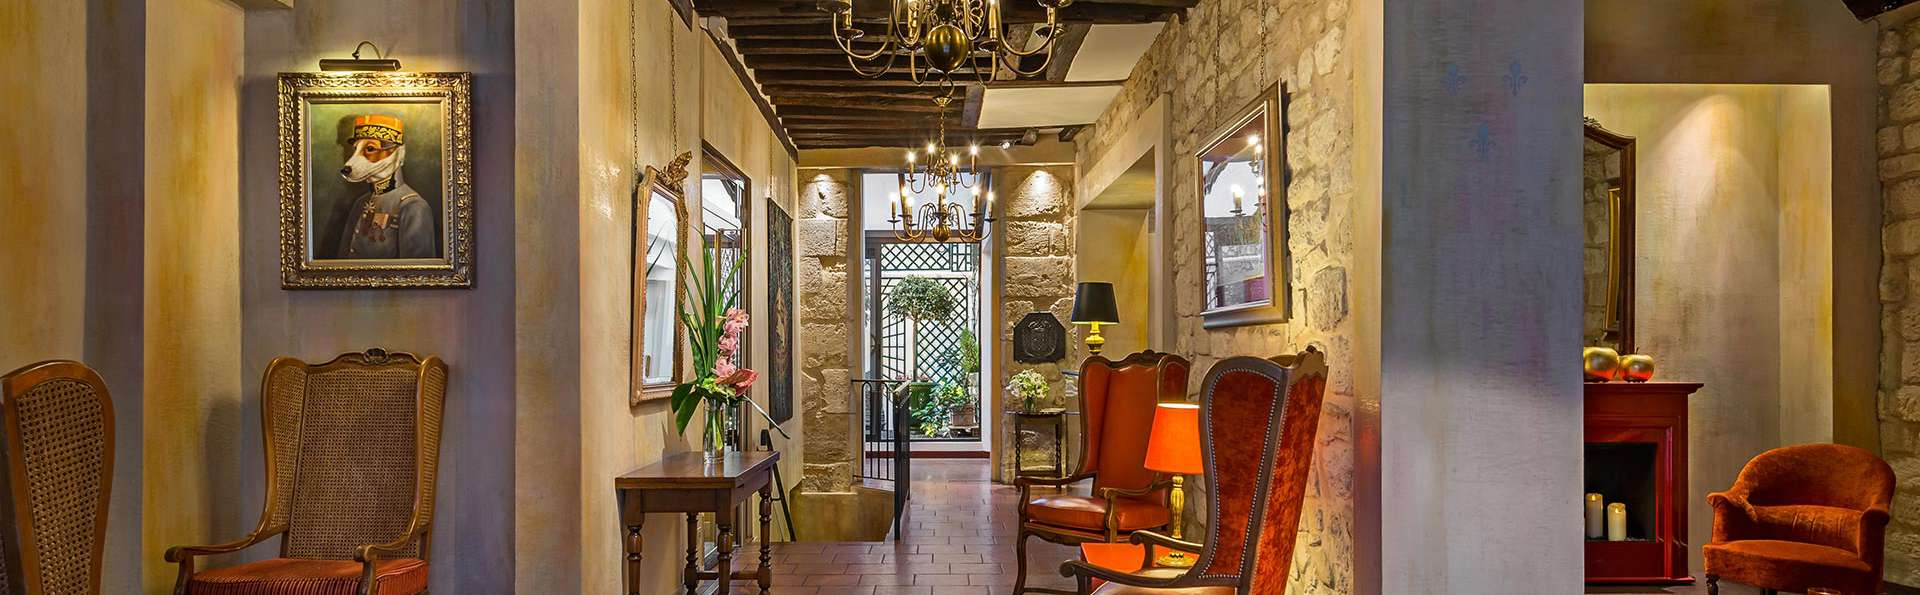 Hôtel Saint Paul Rive Gauche - Edit_Hall.jpg